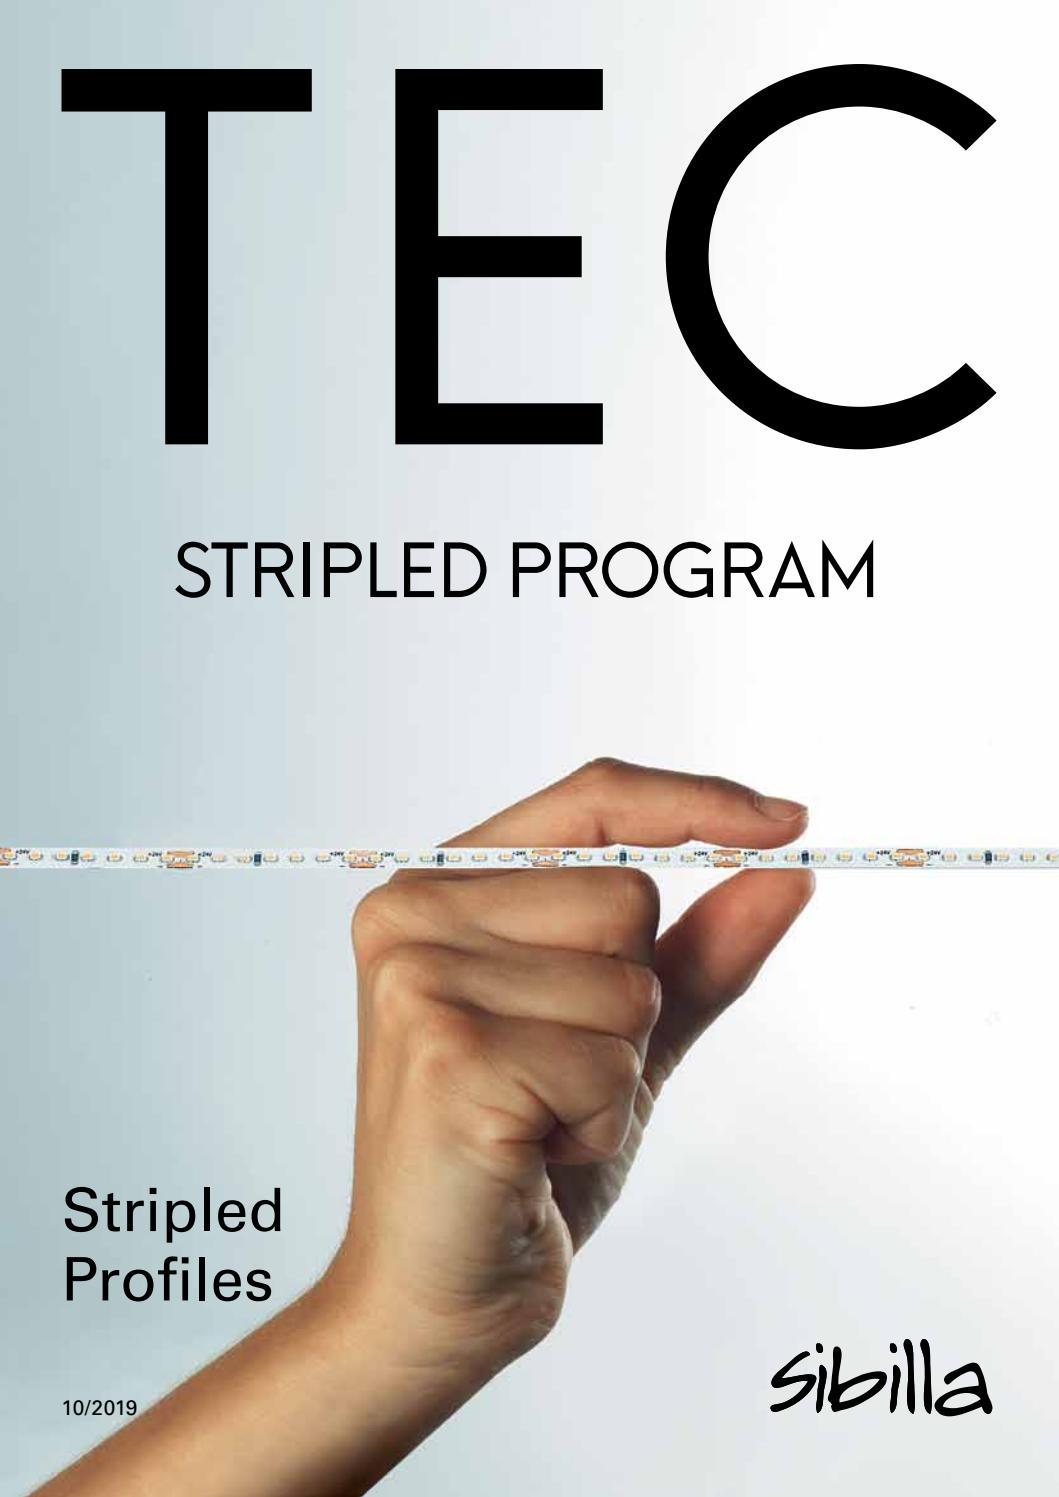 Strip Led Piu Luminosi stripled-program-sibilla by gaxa iluminaciÓn - issuu